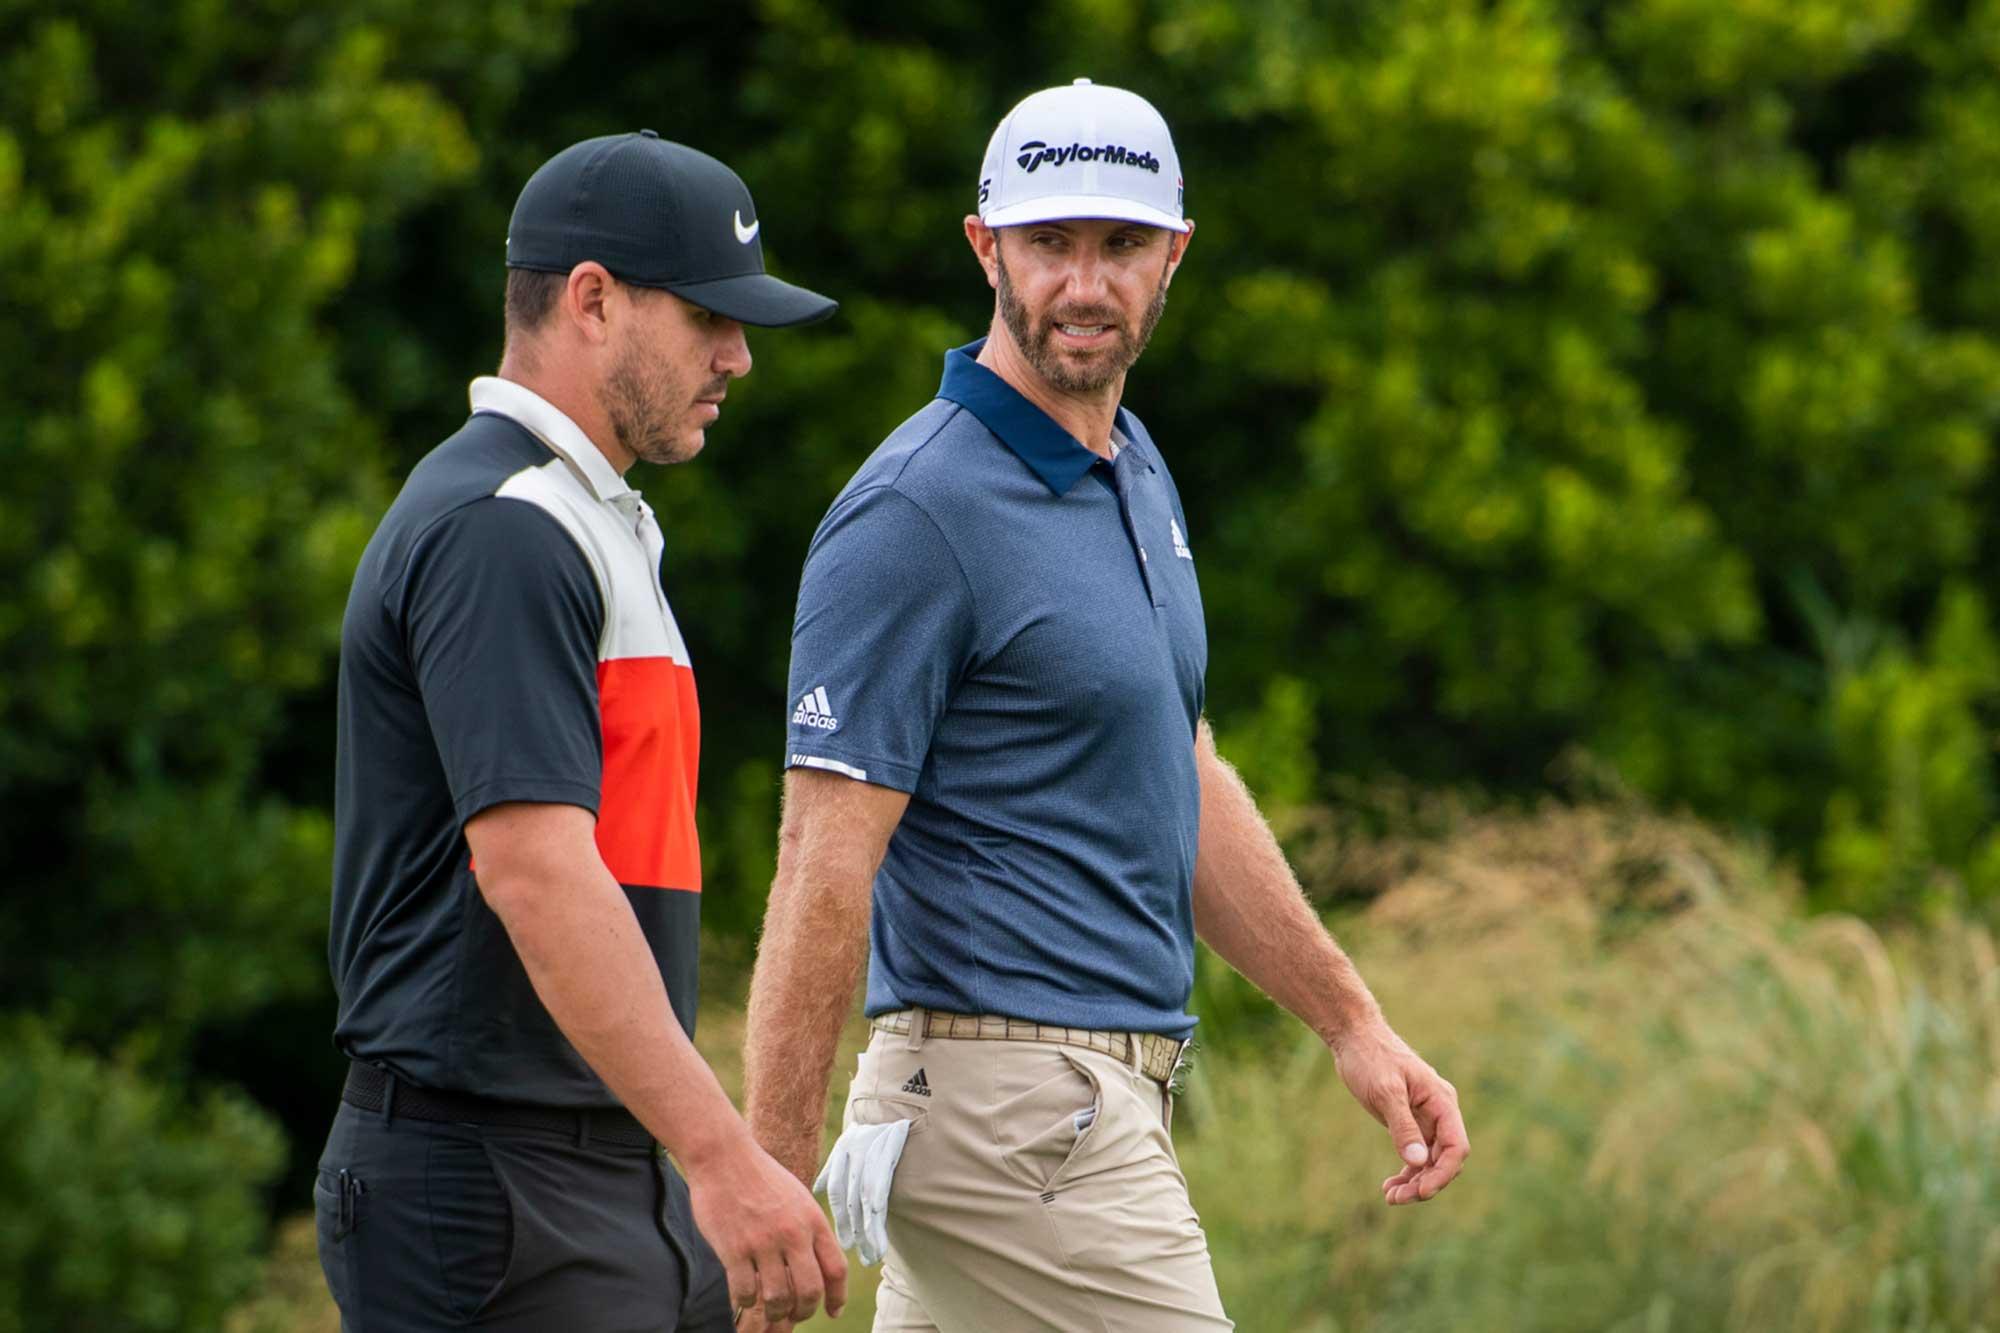 PGA stars receiving $30 million offers for Premier Golf League